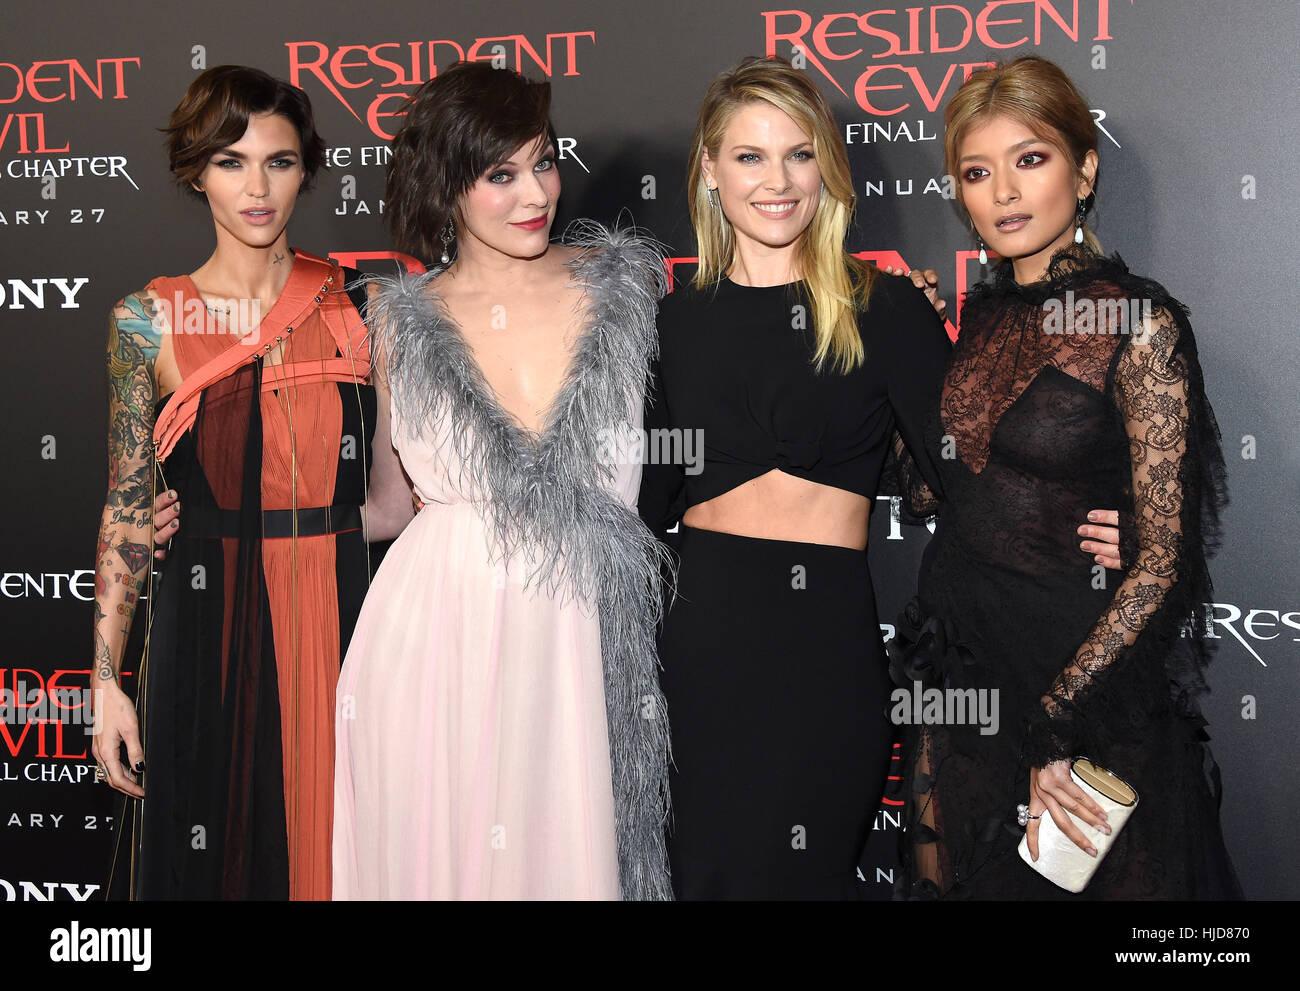 Wallpaper Milla Jovovich Ali Larter Ruby Rose Resident: Hollywood, California, USA. 23rd Jan, 2017. Ruby Rose